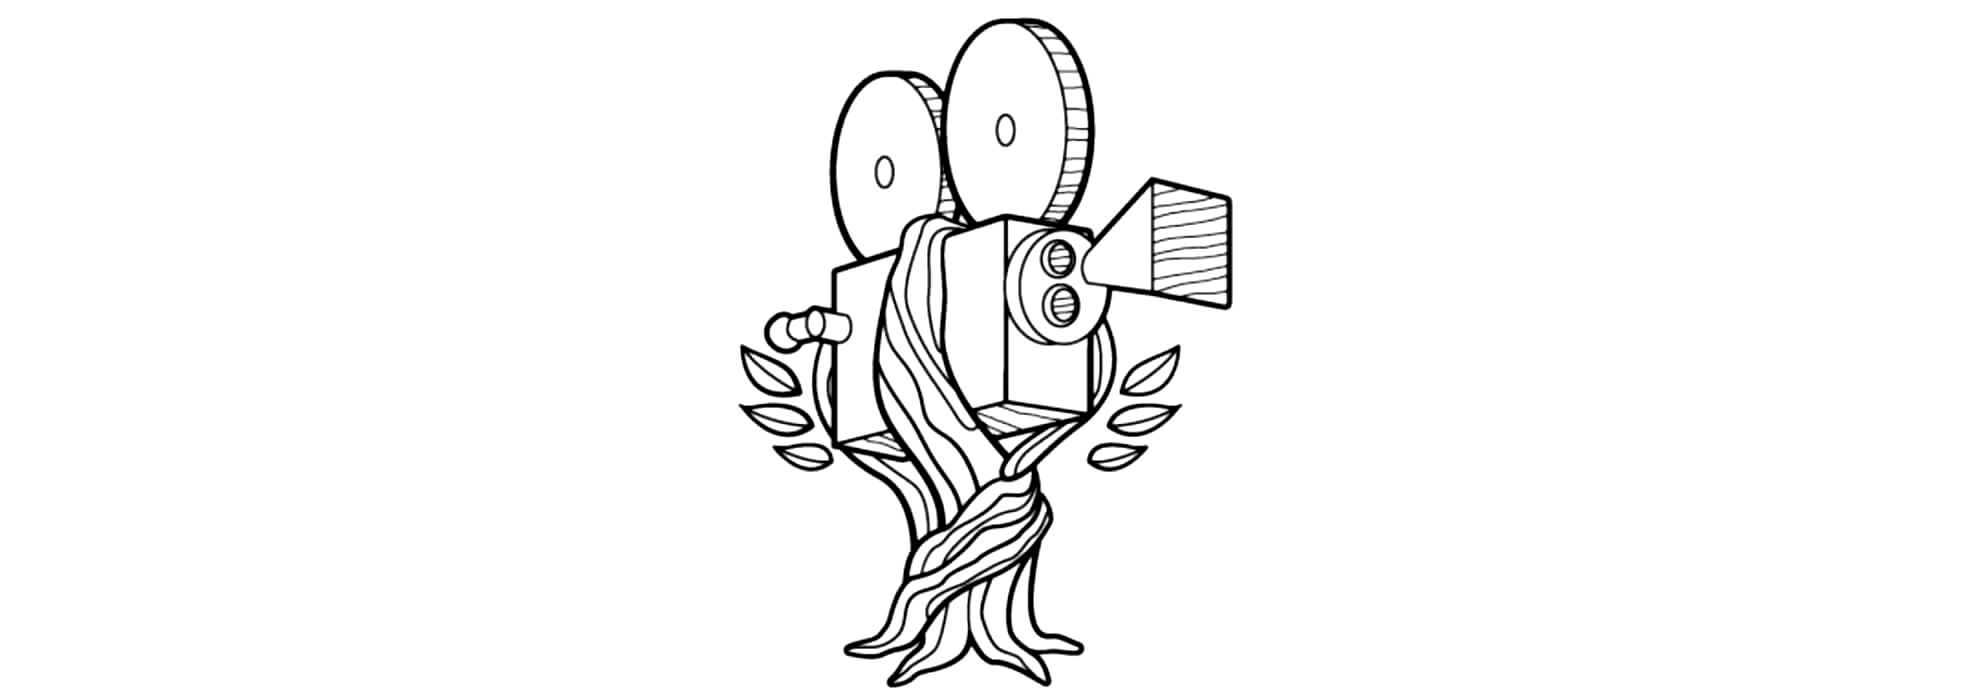 laurel+tree+with+film+camera+BIGGEST.jpg